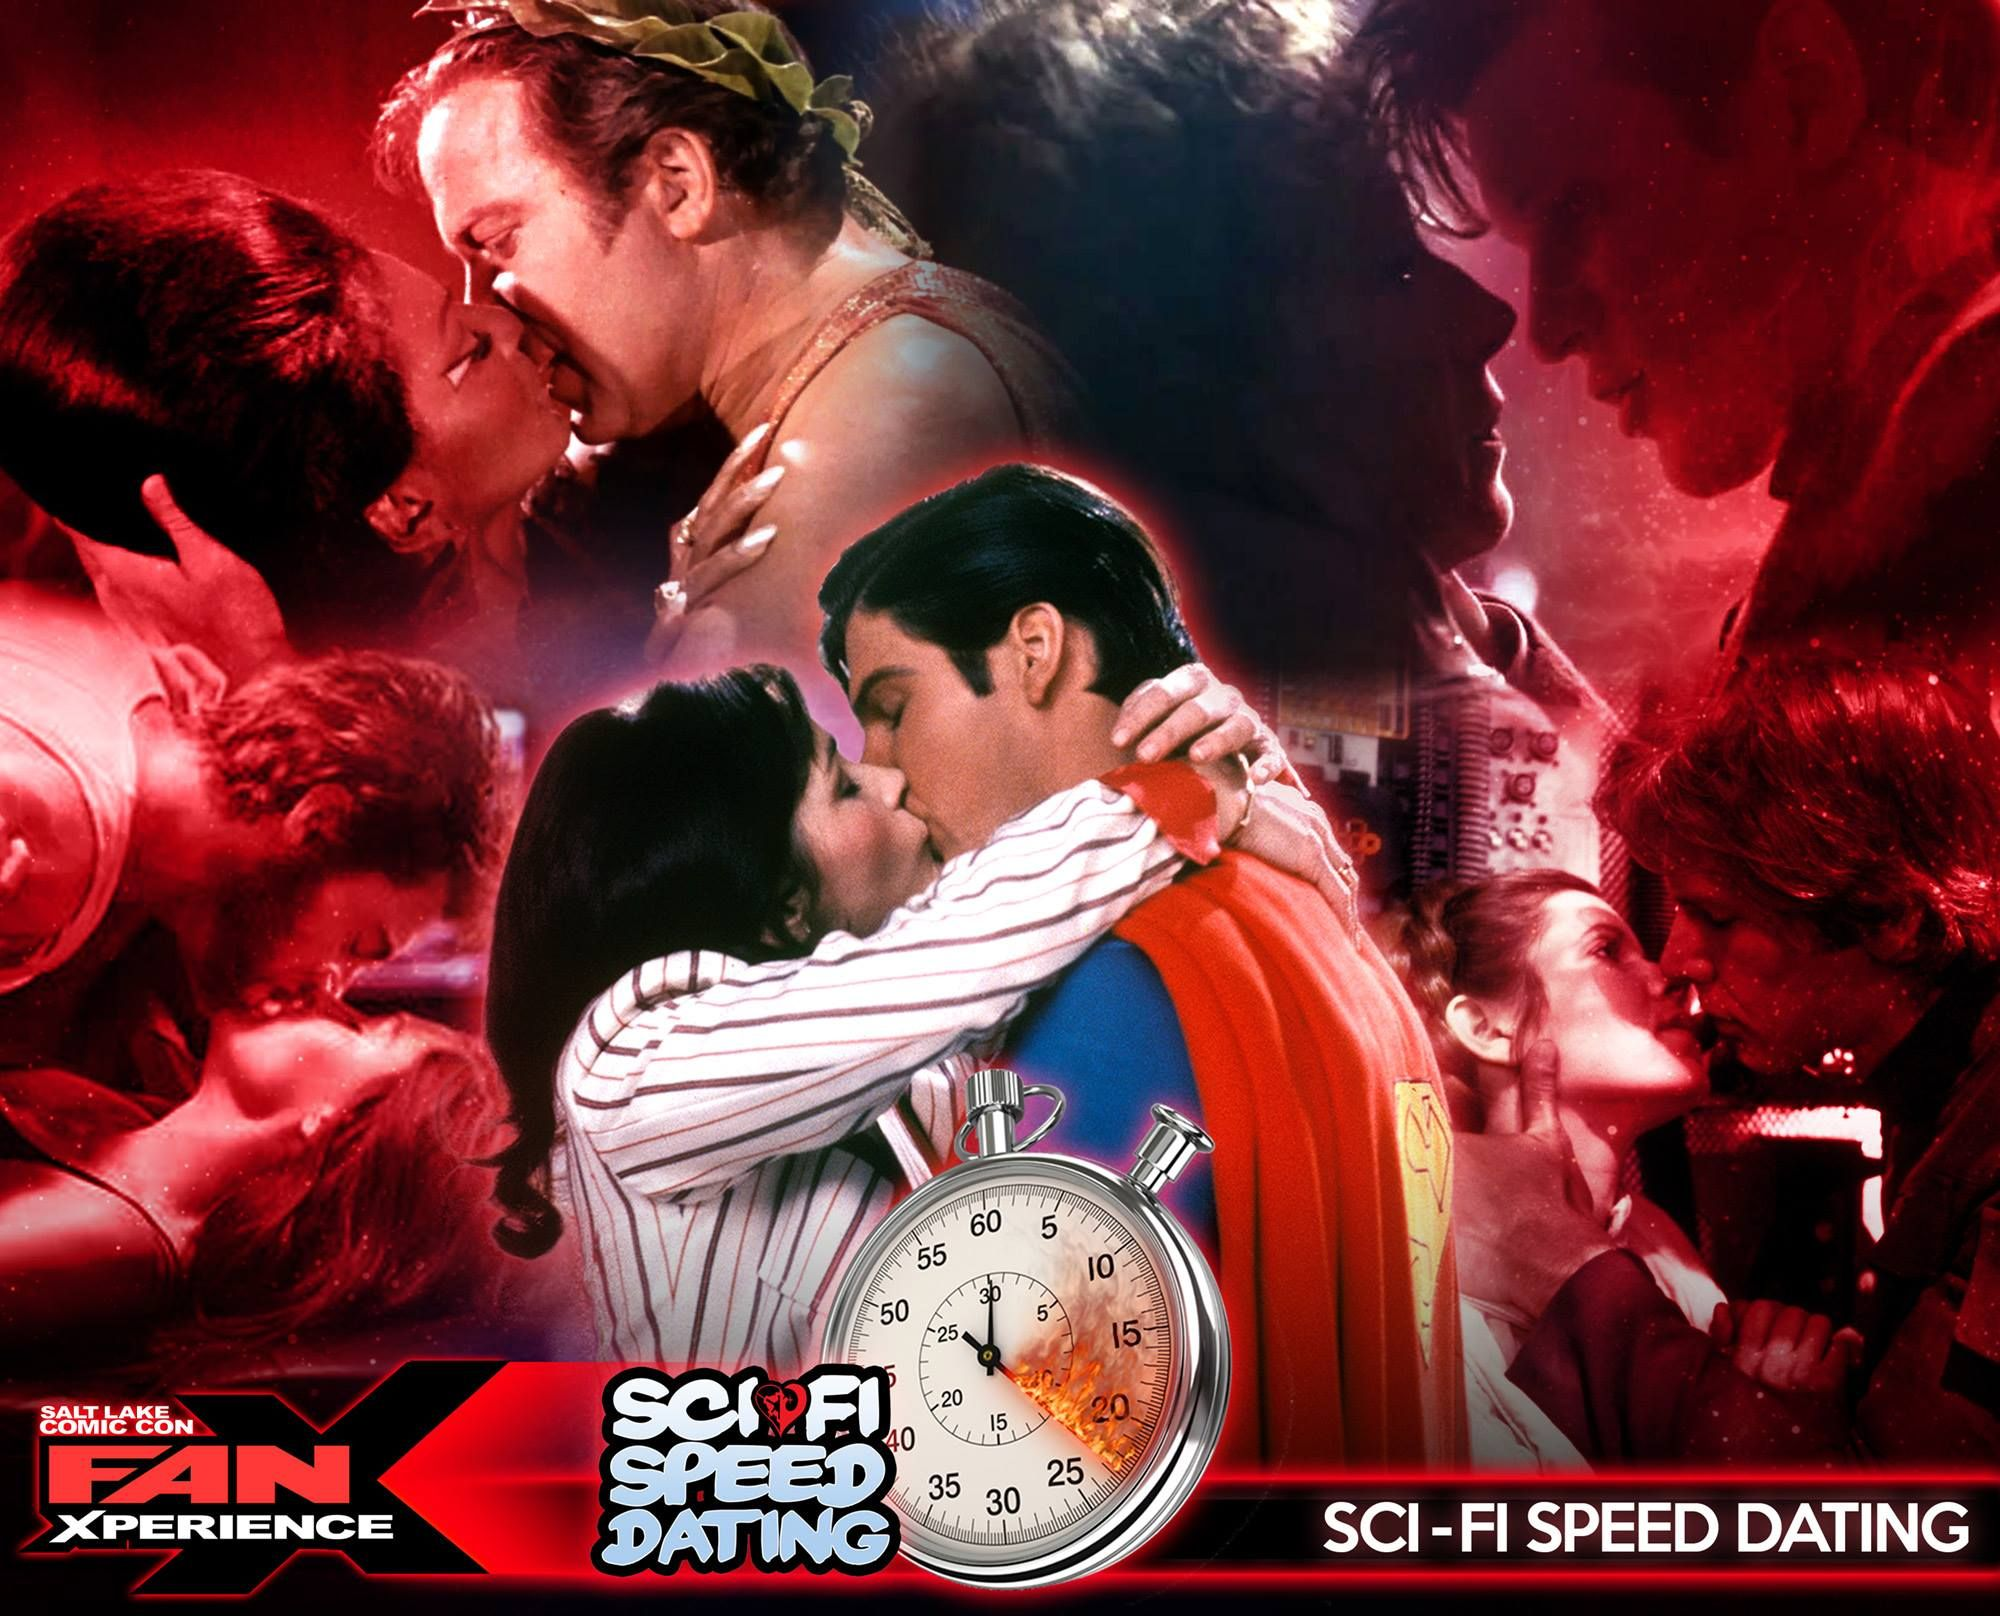 Salt Lake speed dating online dating aansluiting sites